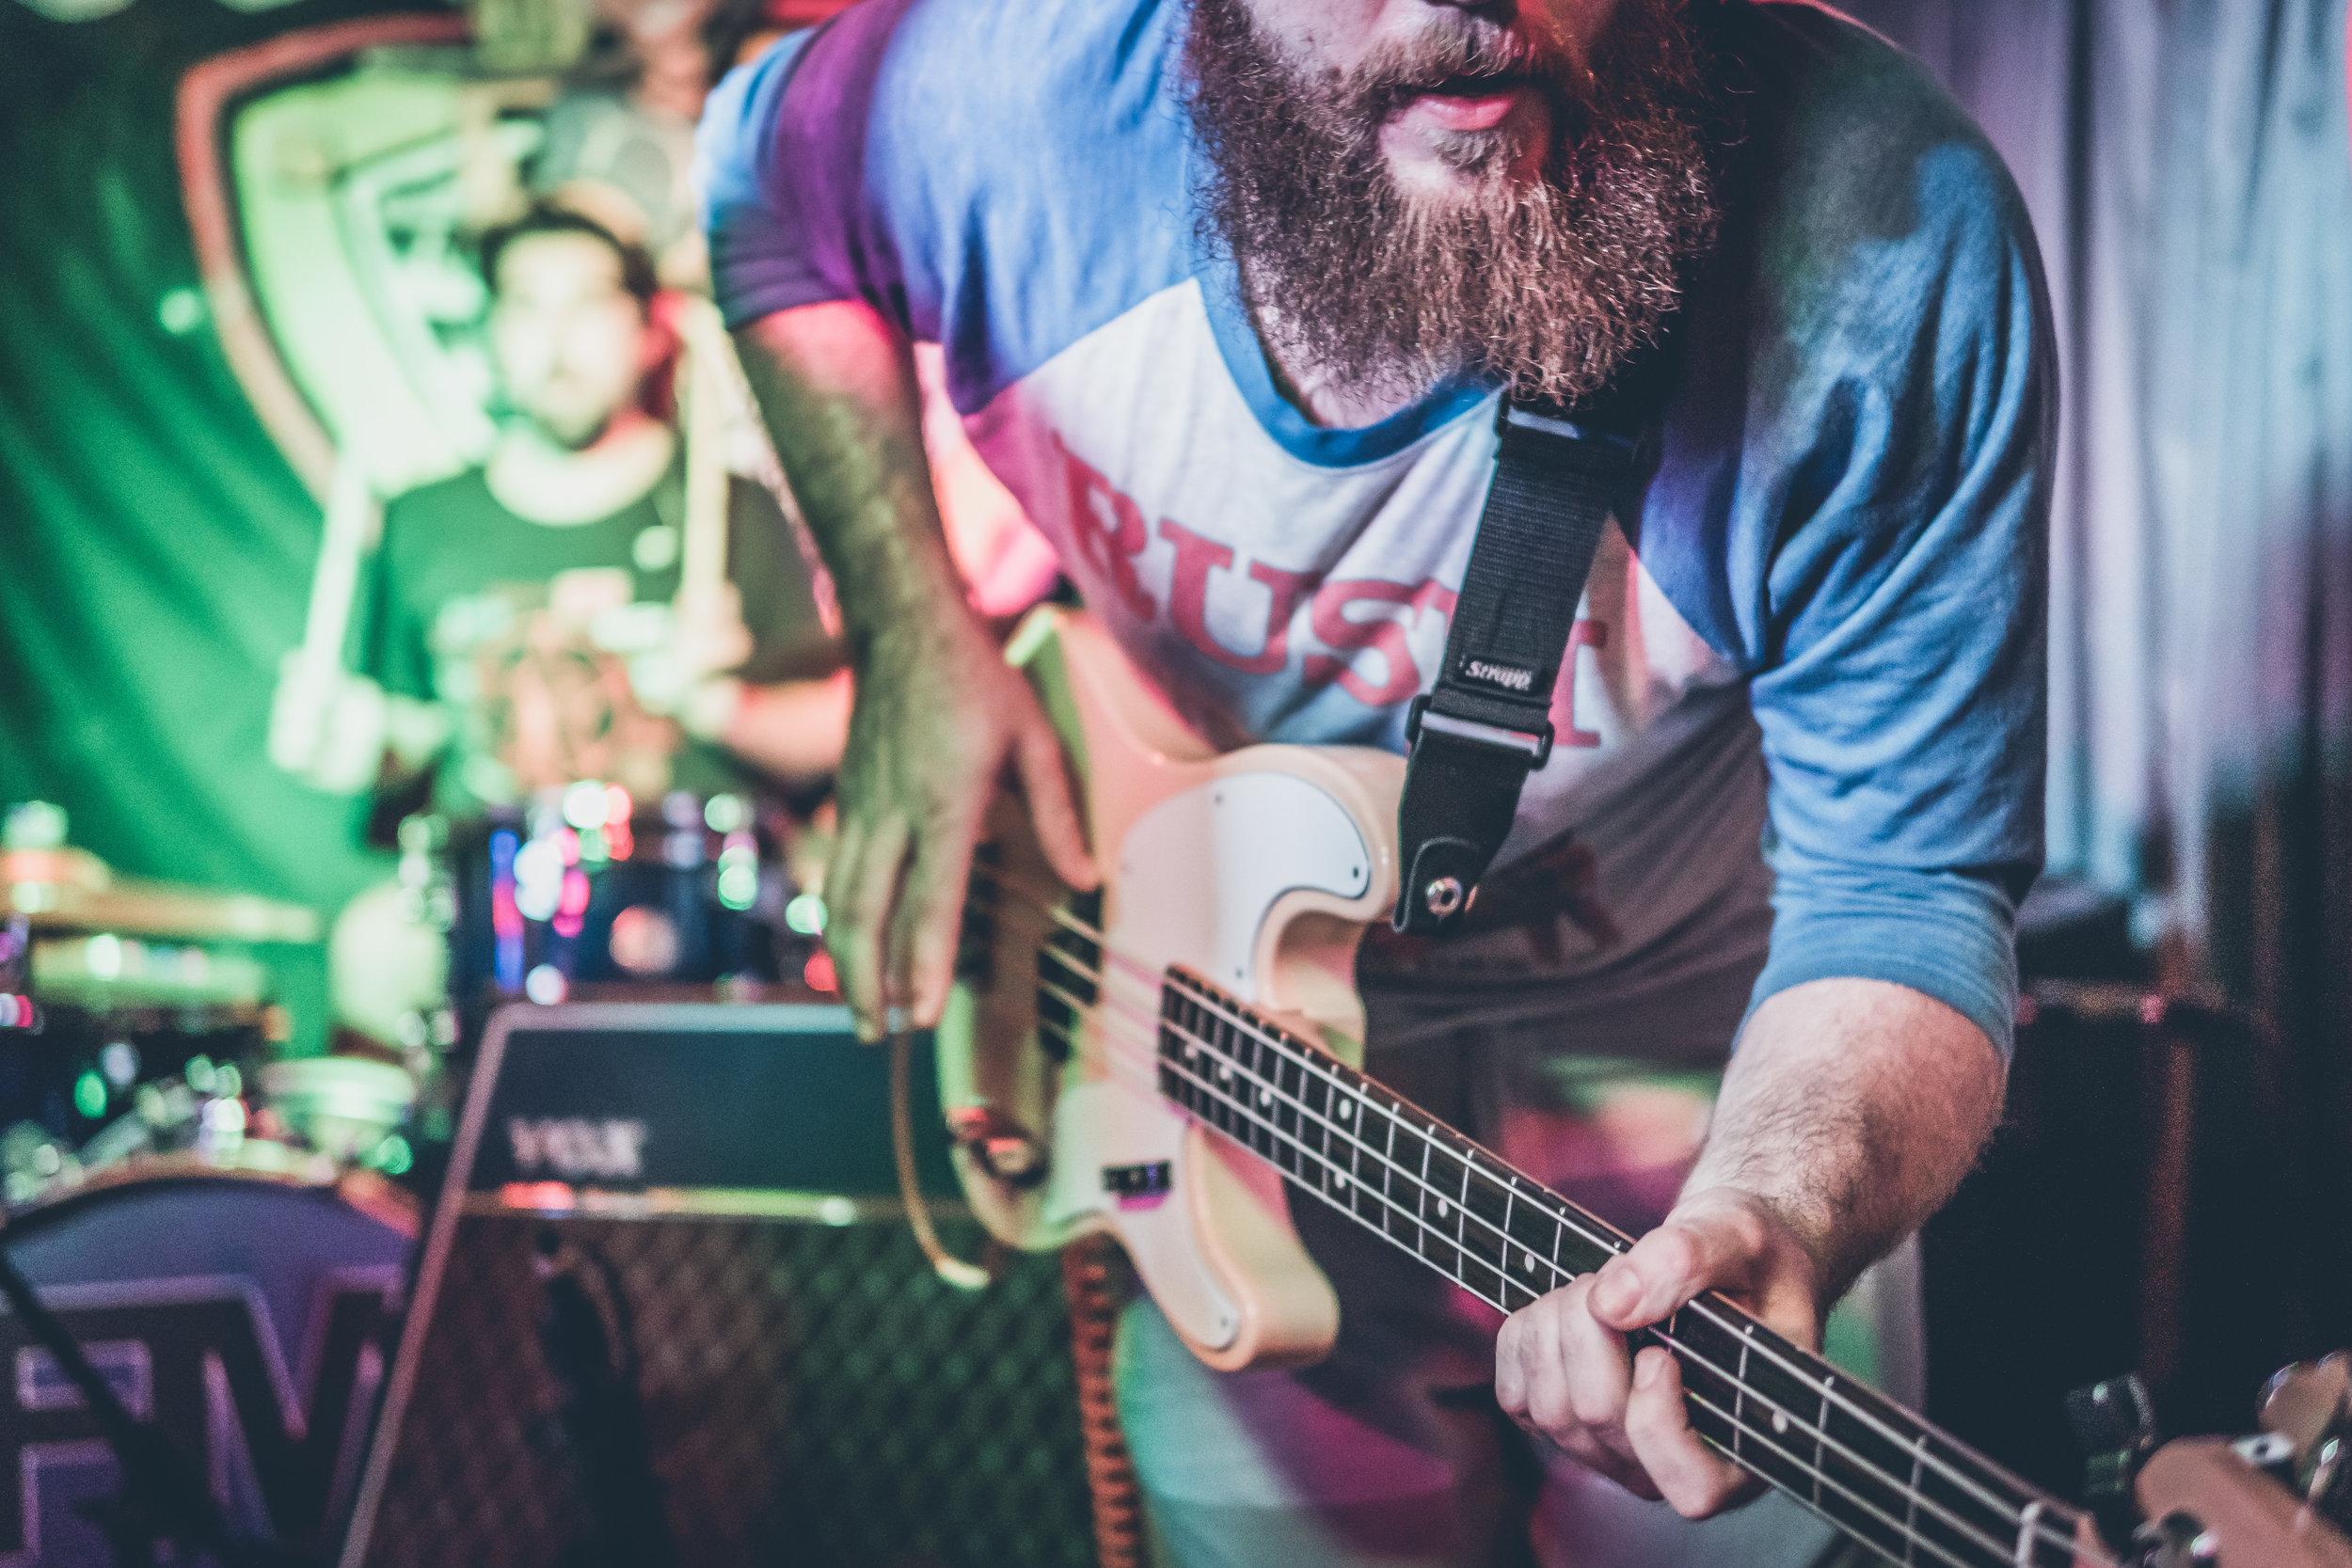 FM Pilots - Tulsa Rock Band - The Boobie Trap Bar Topeka, KS 070916-11.jpg